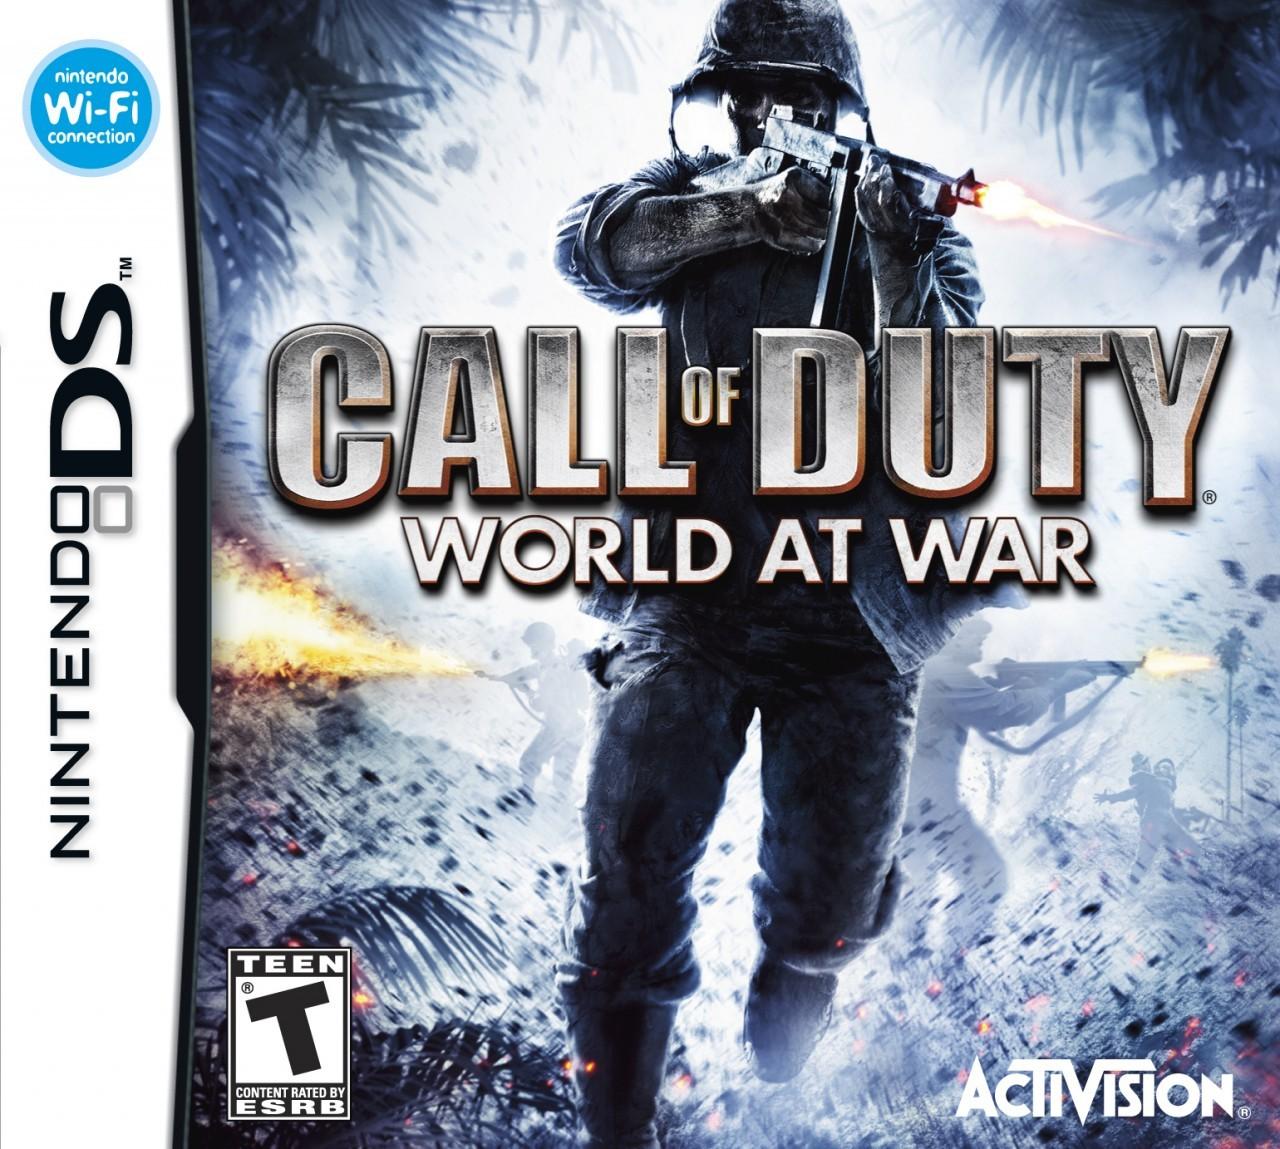 Arquivo:DS world at war.jpg